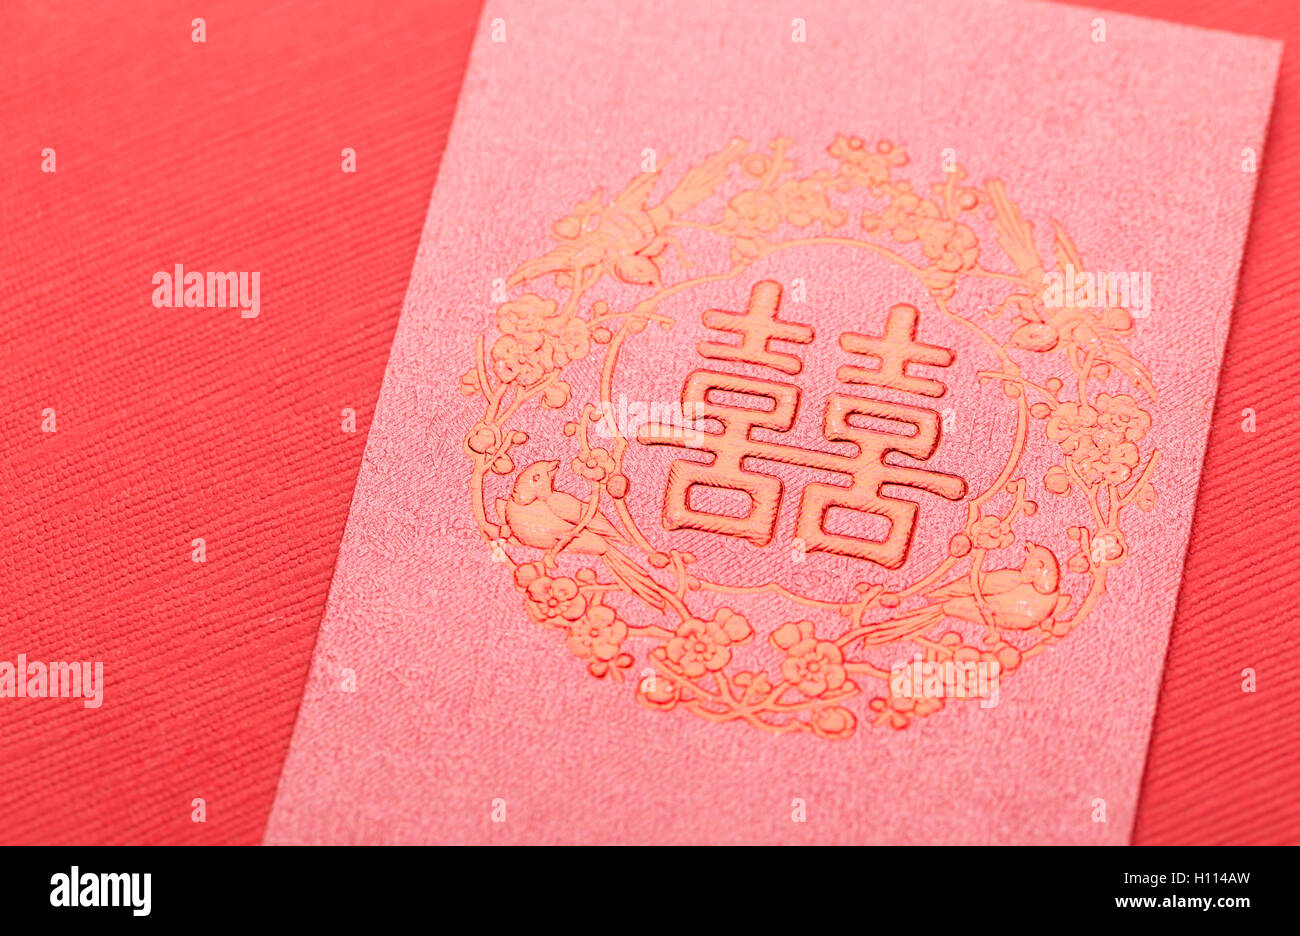 Chinese style wedding invitation card Stock Photo: 121112625 - Alamy